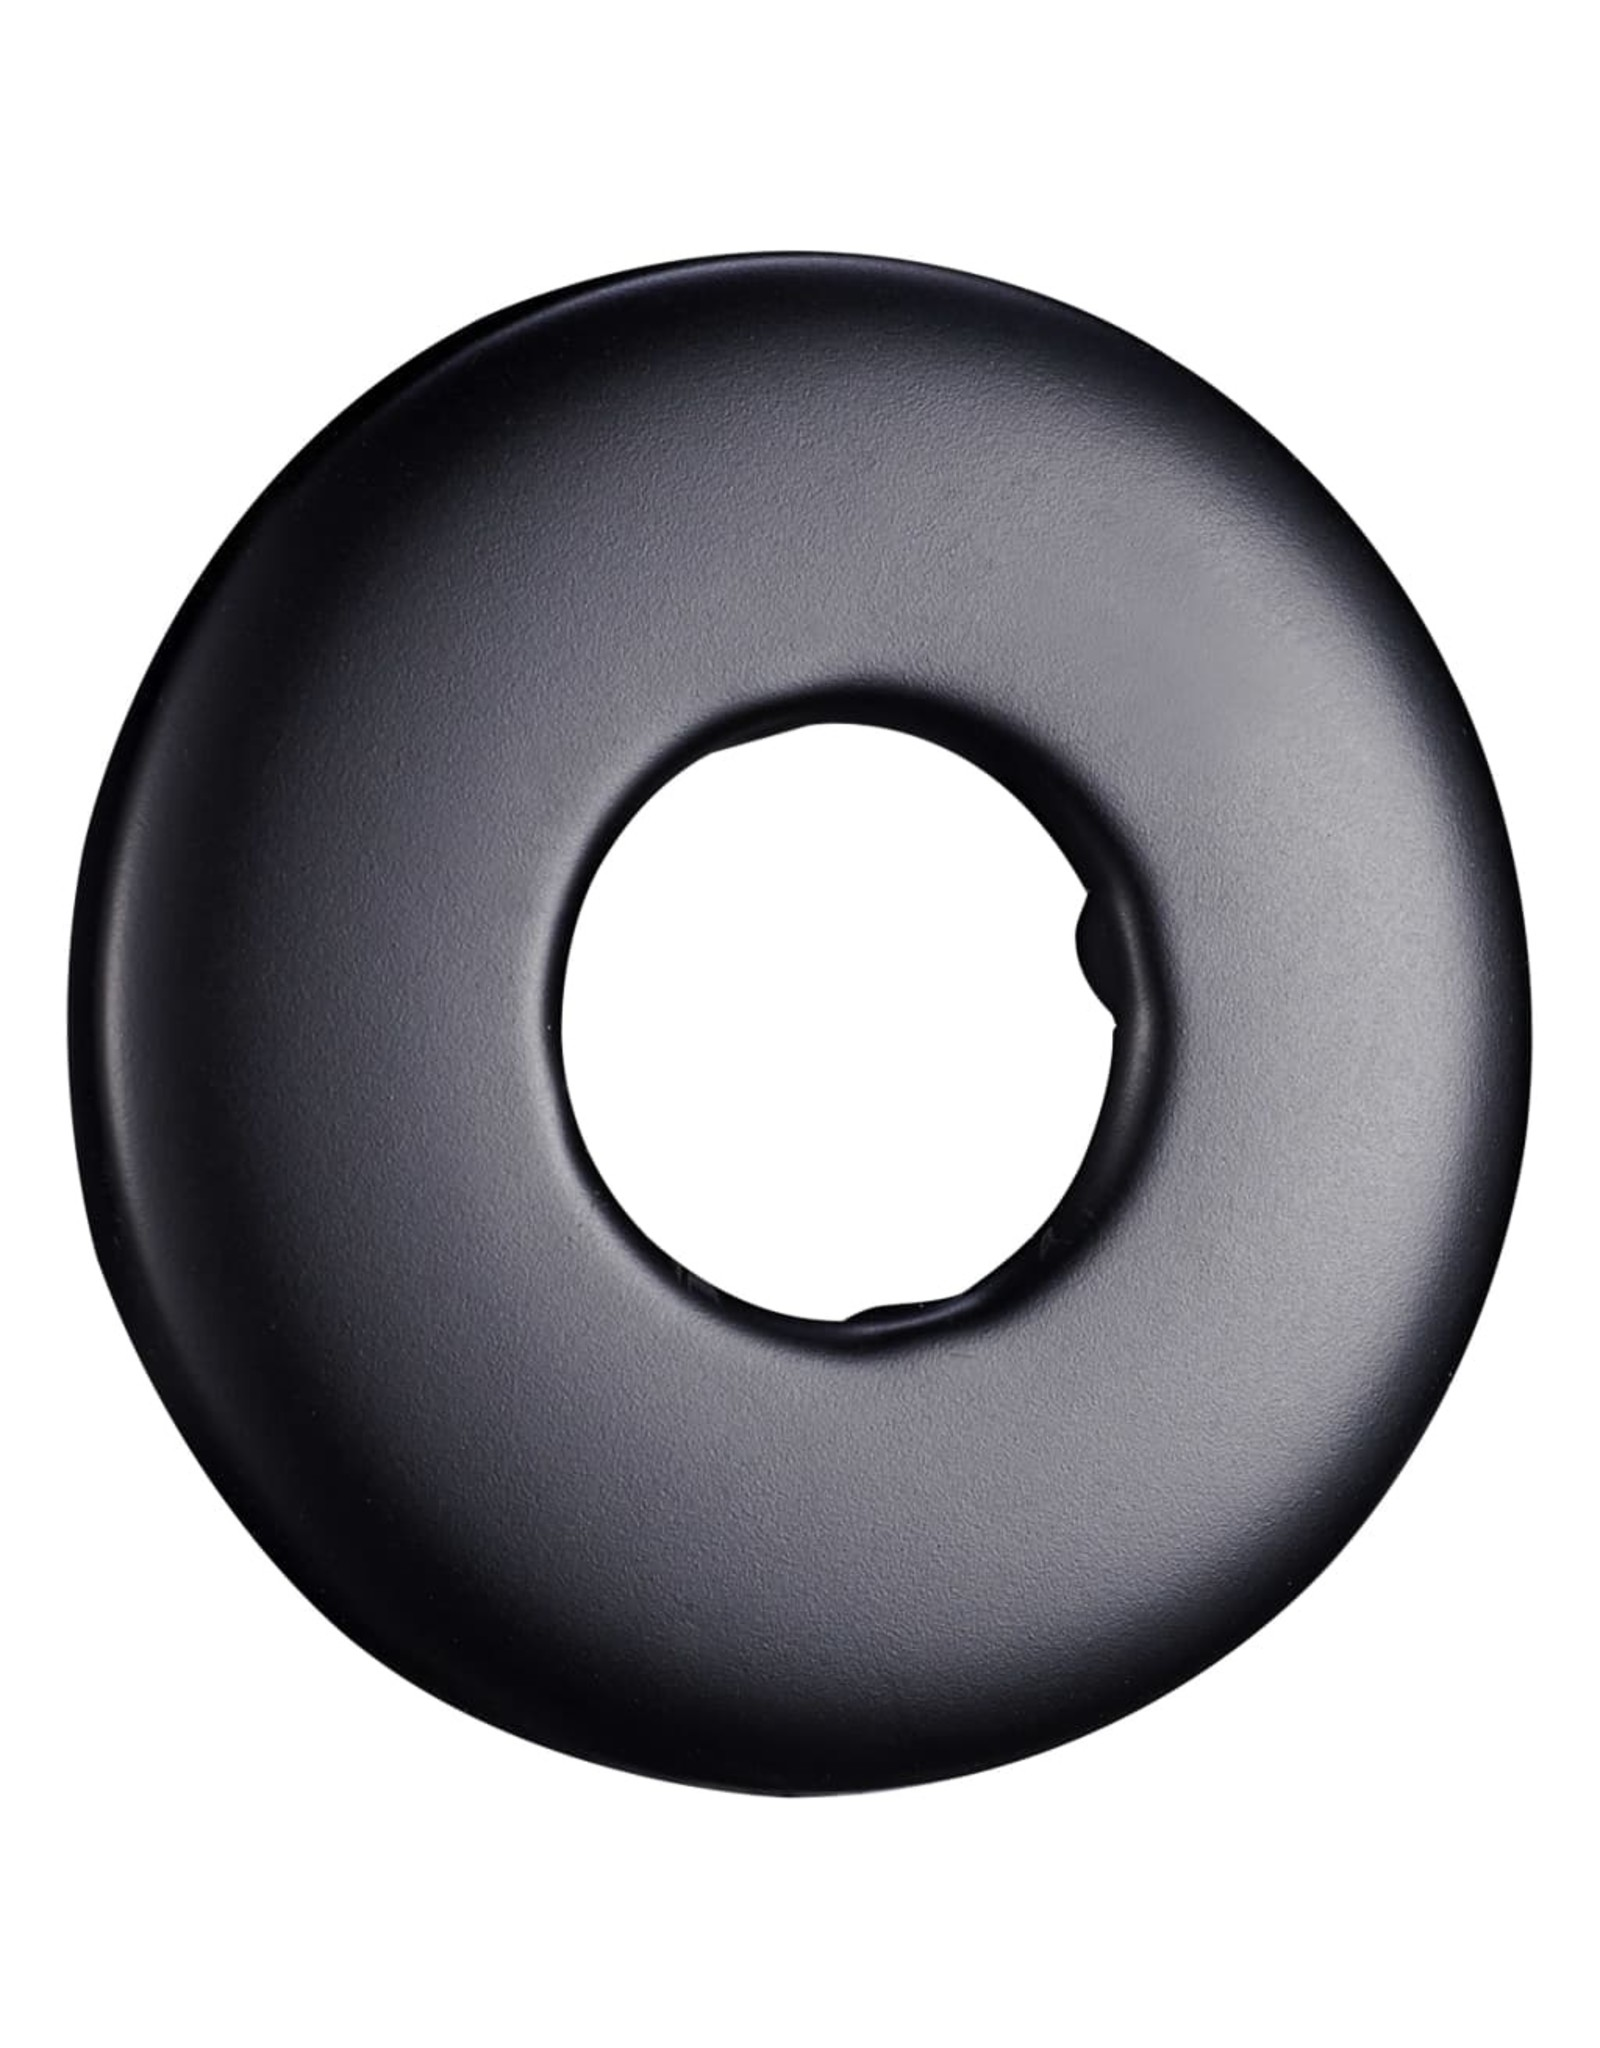 Douchearm rond 30 cm roestvrij staal 201 zwart